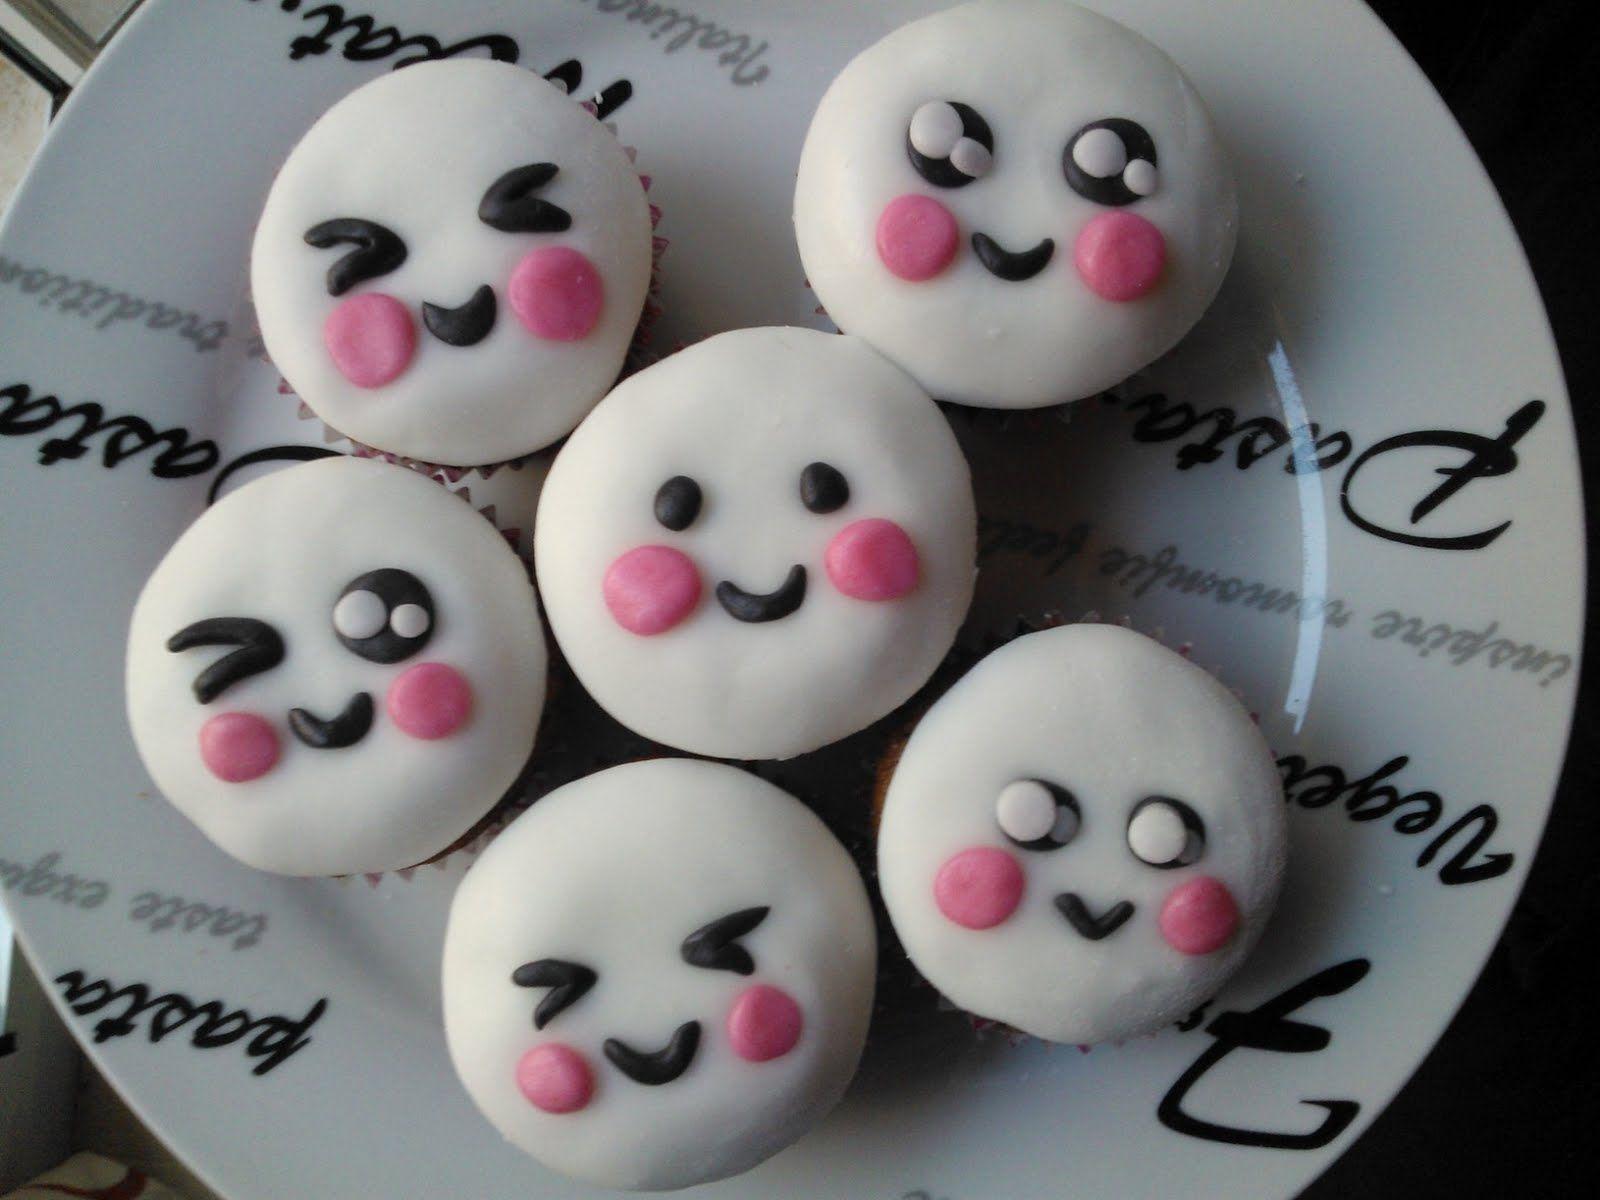 Pin de yeimi paipilla en postres | Pinterest | Figuras de porcelana ...